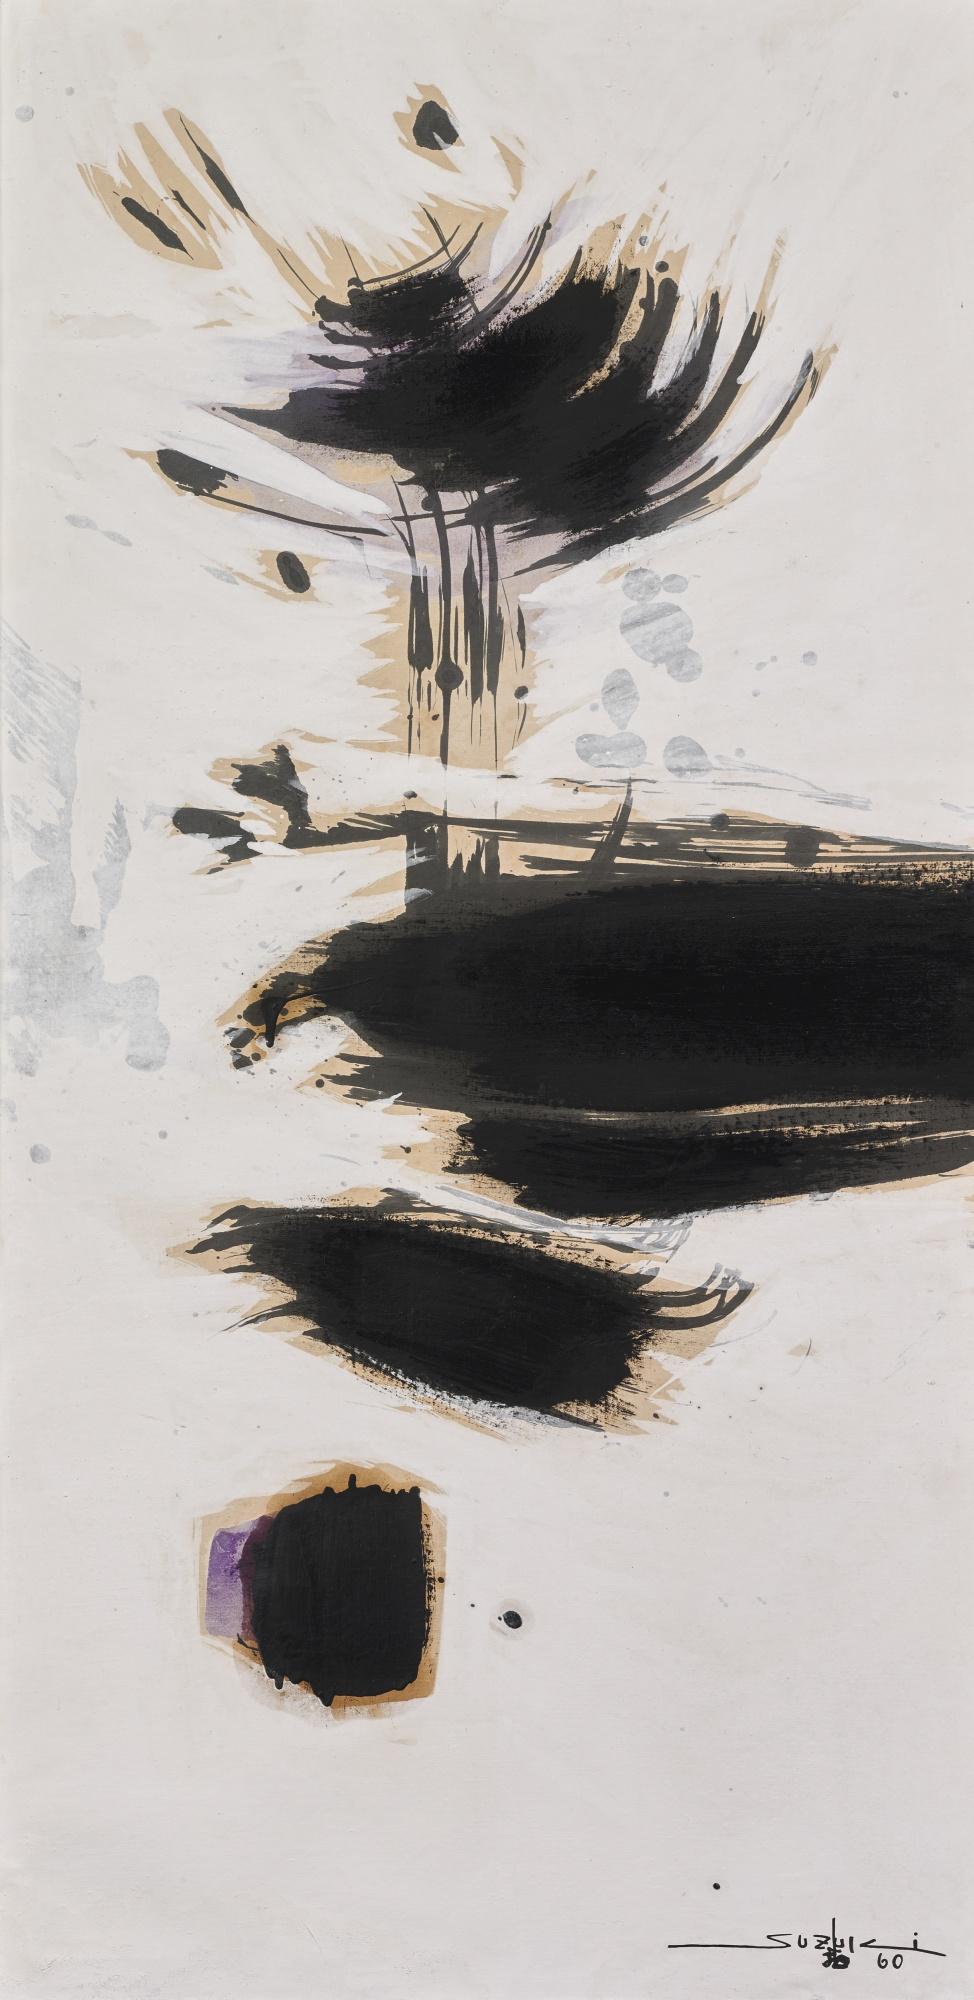 Takashi Suzuki-Chesecaria-1960